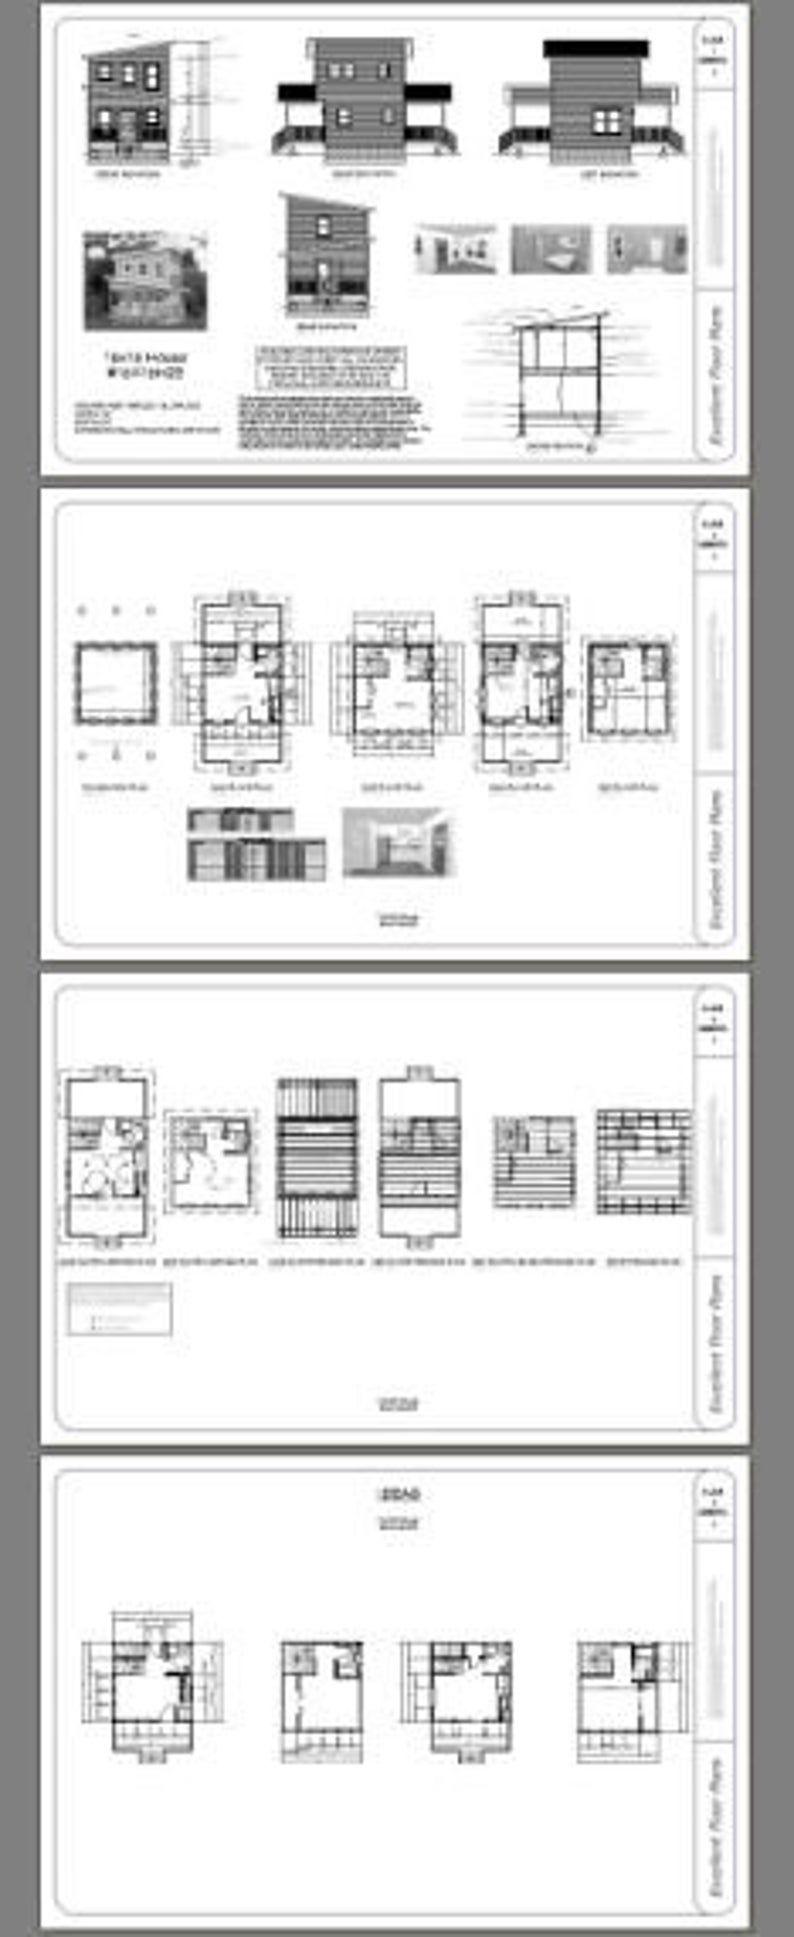 16x16 House 1-Bedroom 1.5-Bath 465 sq ft PDF Floor   Etsy